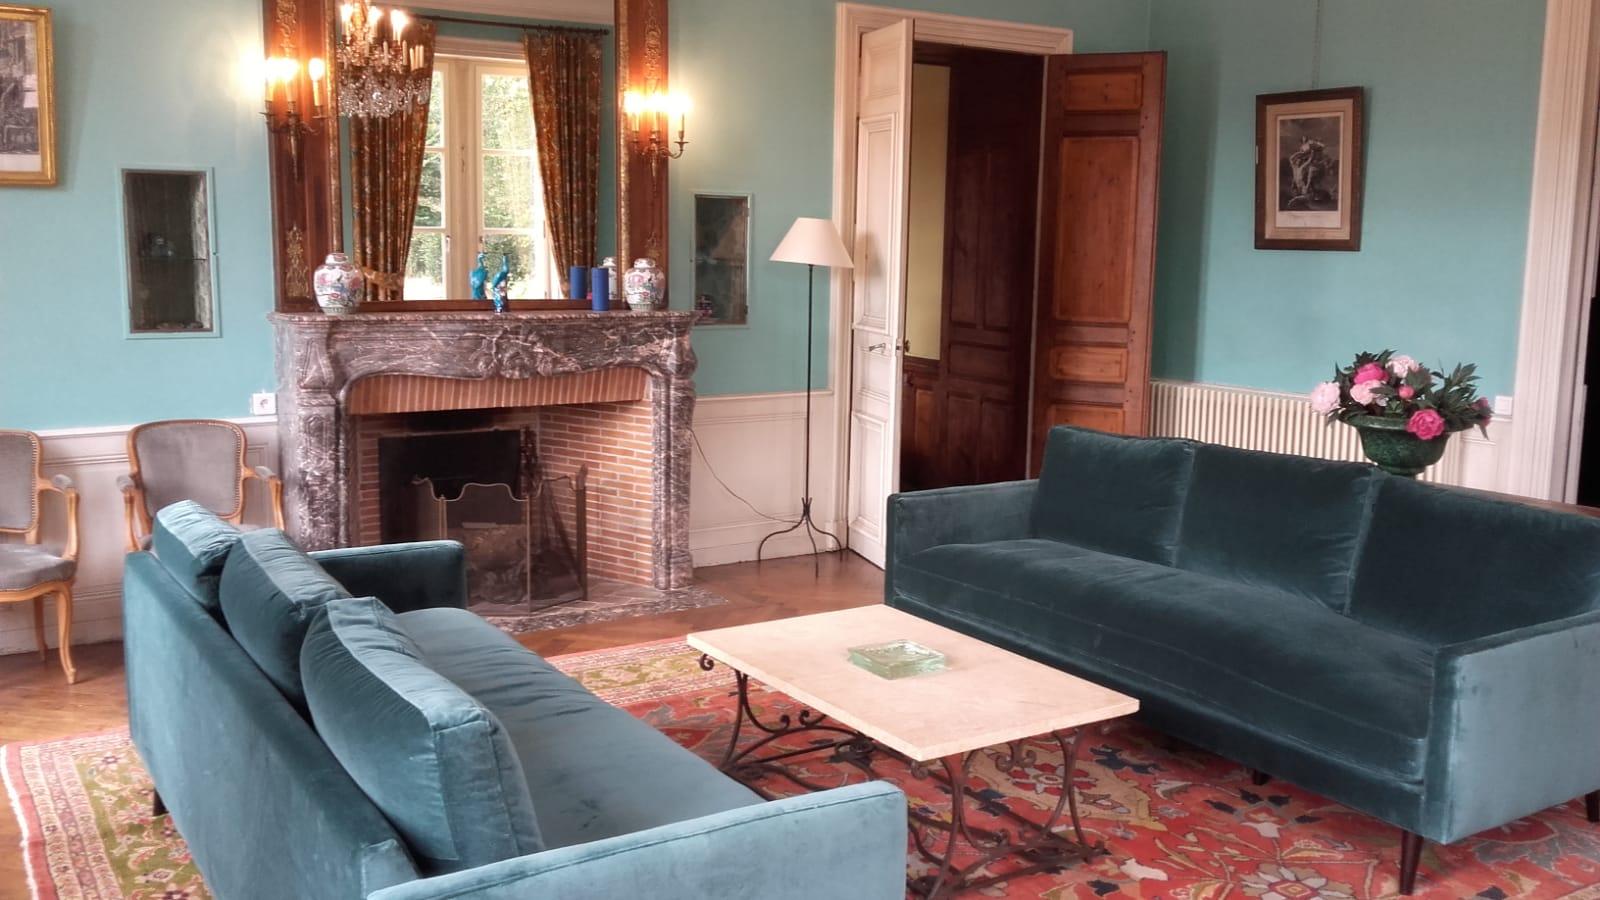 Grand salon- Living room